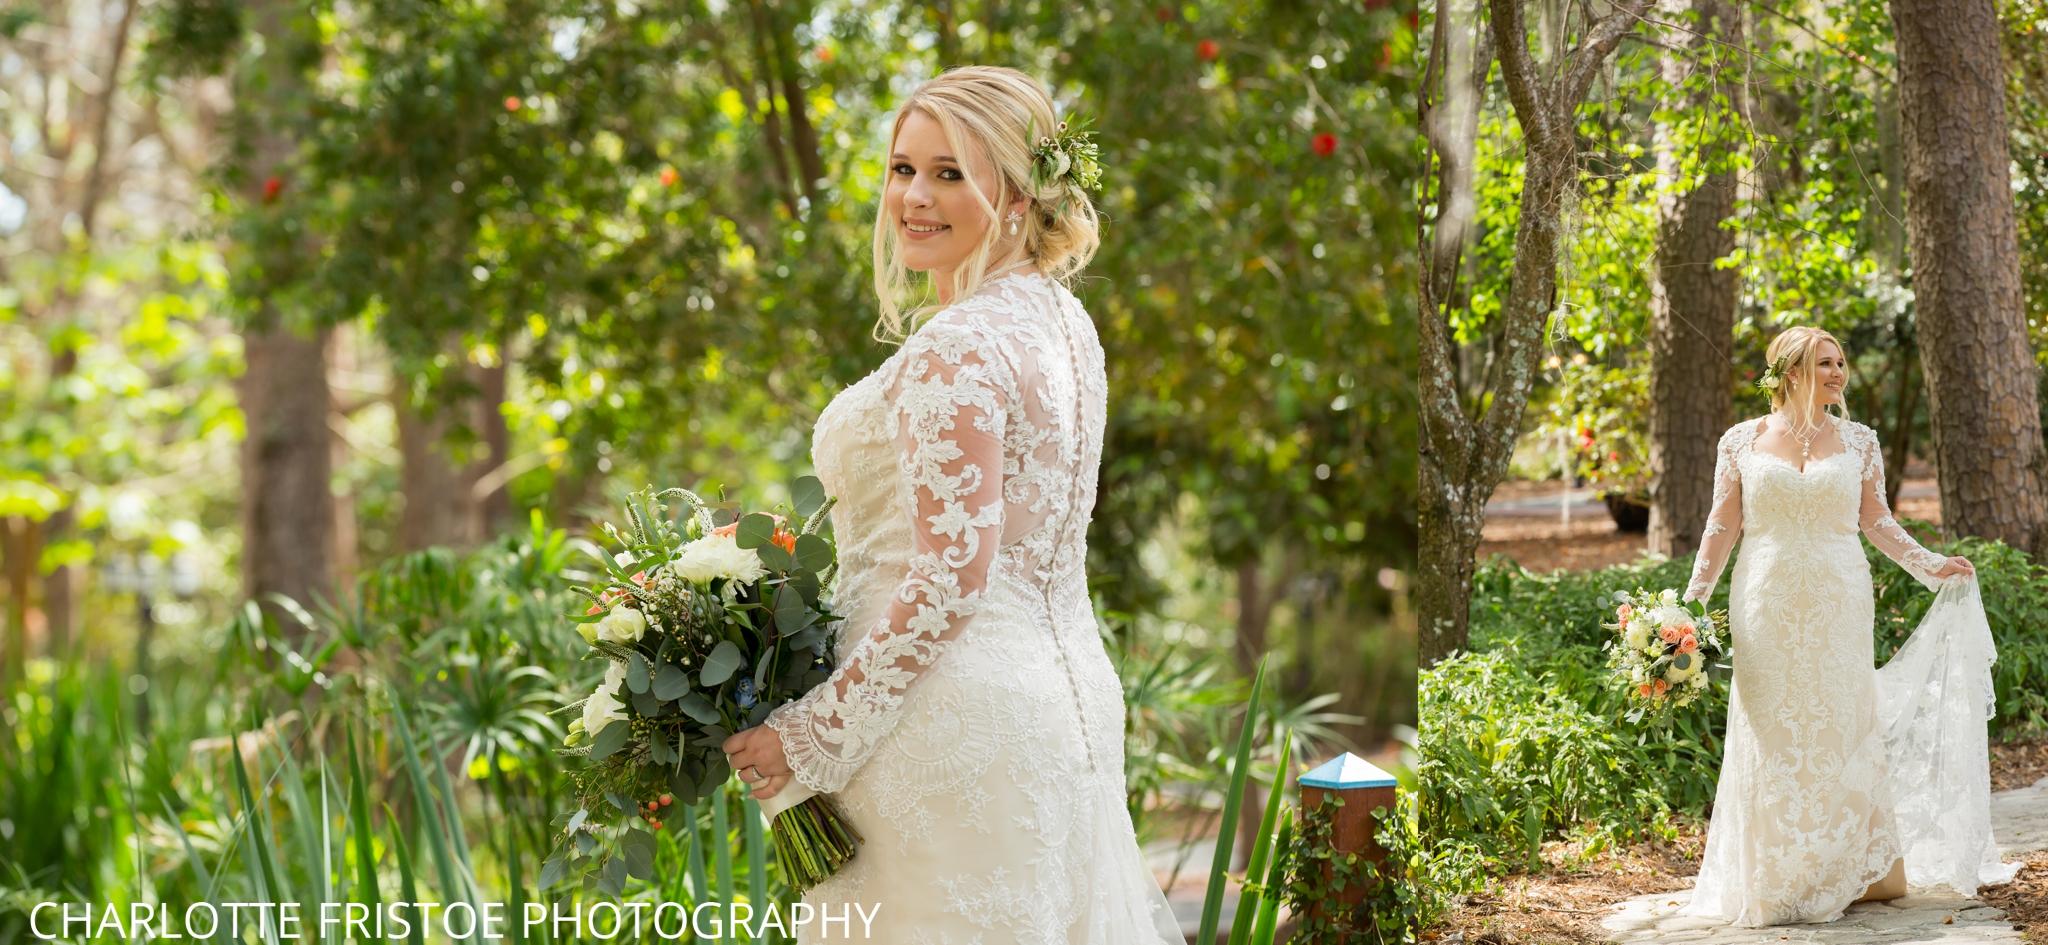 Charlotte Fristoe Photography Wedding-20.jpg